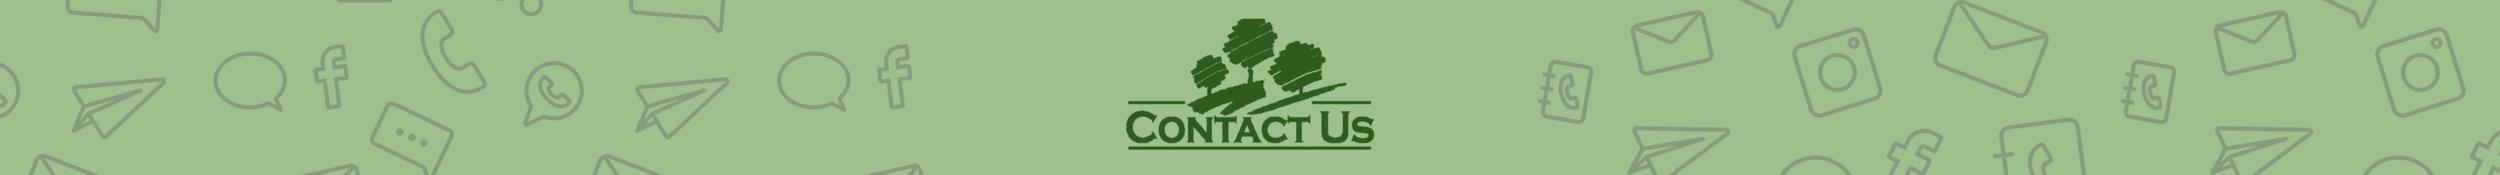 Contact banner Burnham.png